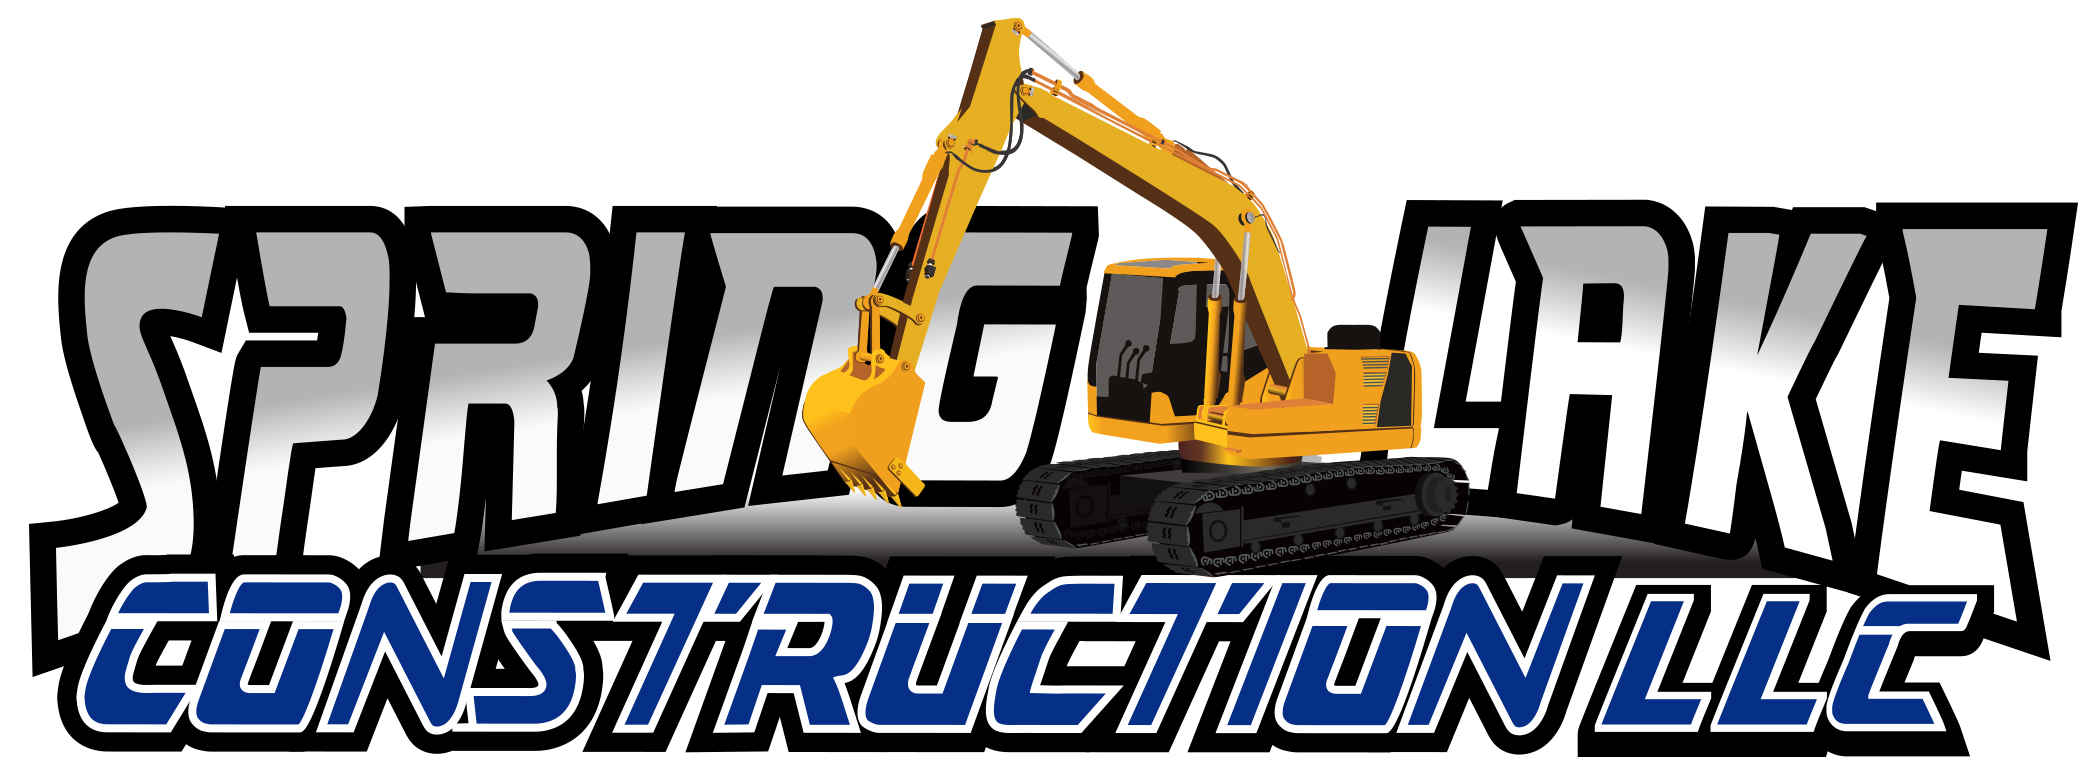 Spring Lake Construction LLC